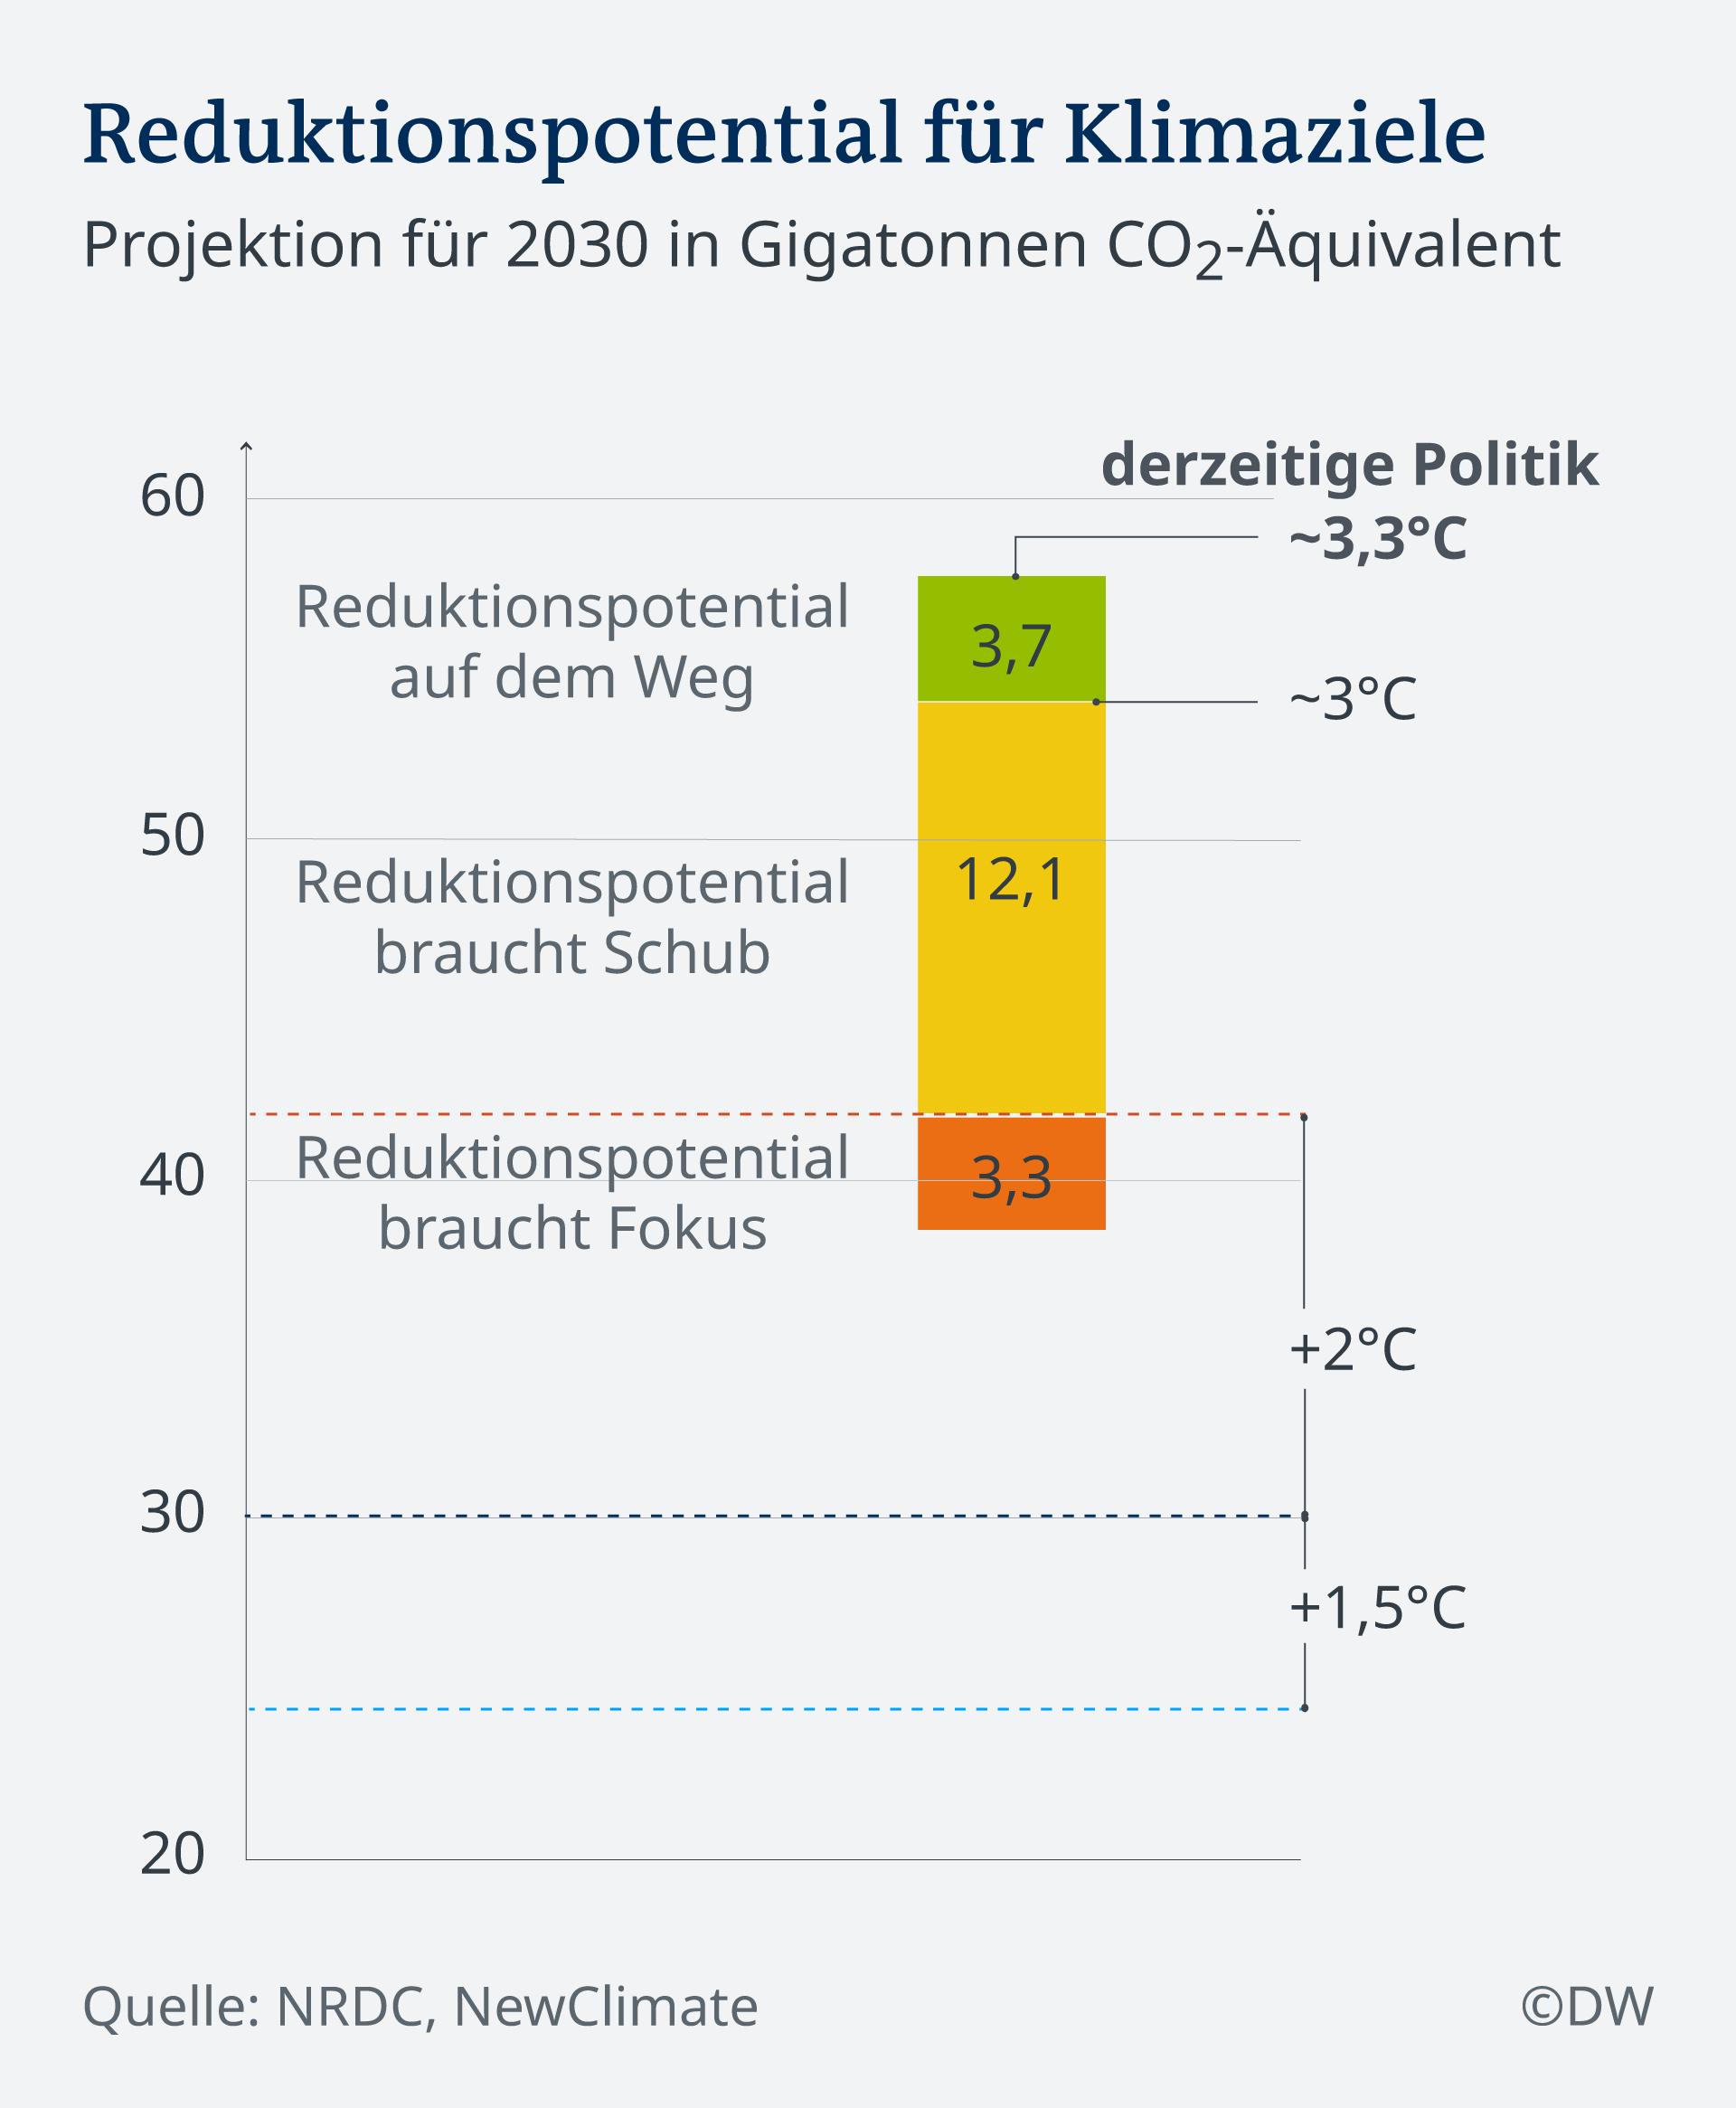 Infografik Reduktionspotentzial für Klimaziele De